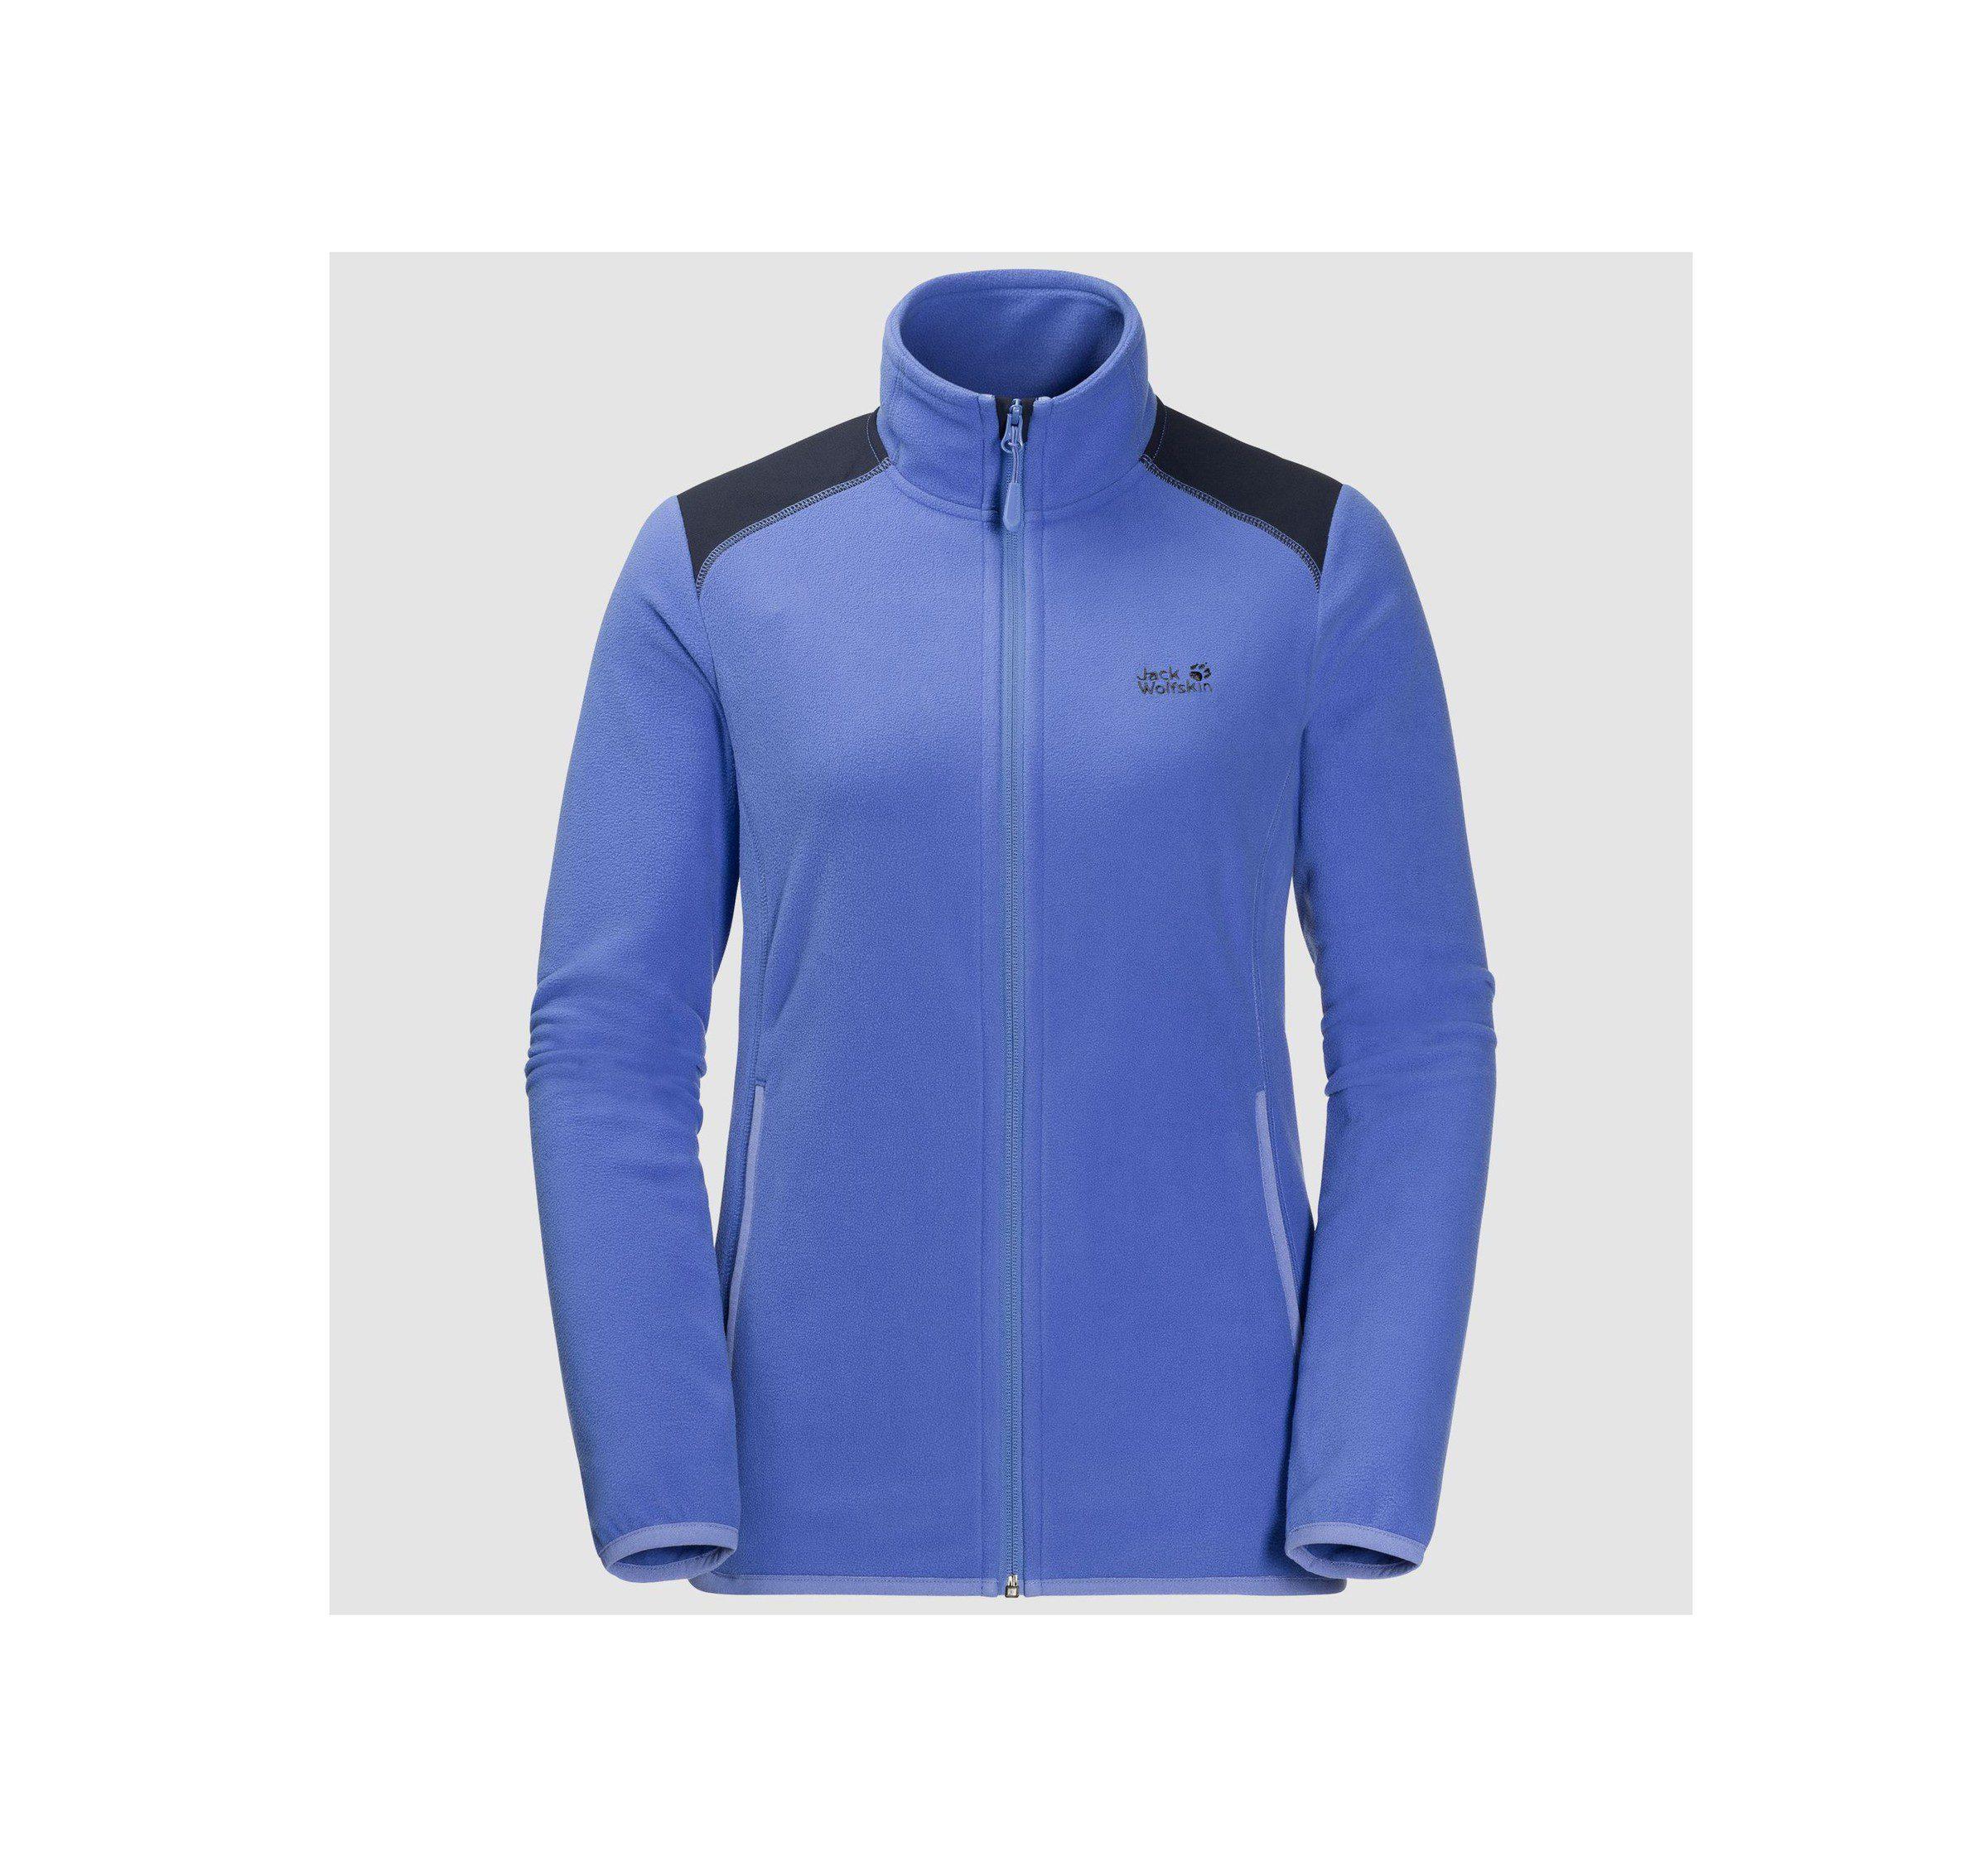 Jack wolfskin womens perfomrance flex jacket - baja blue